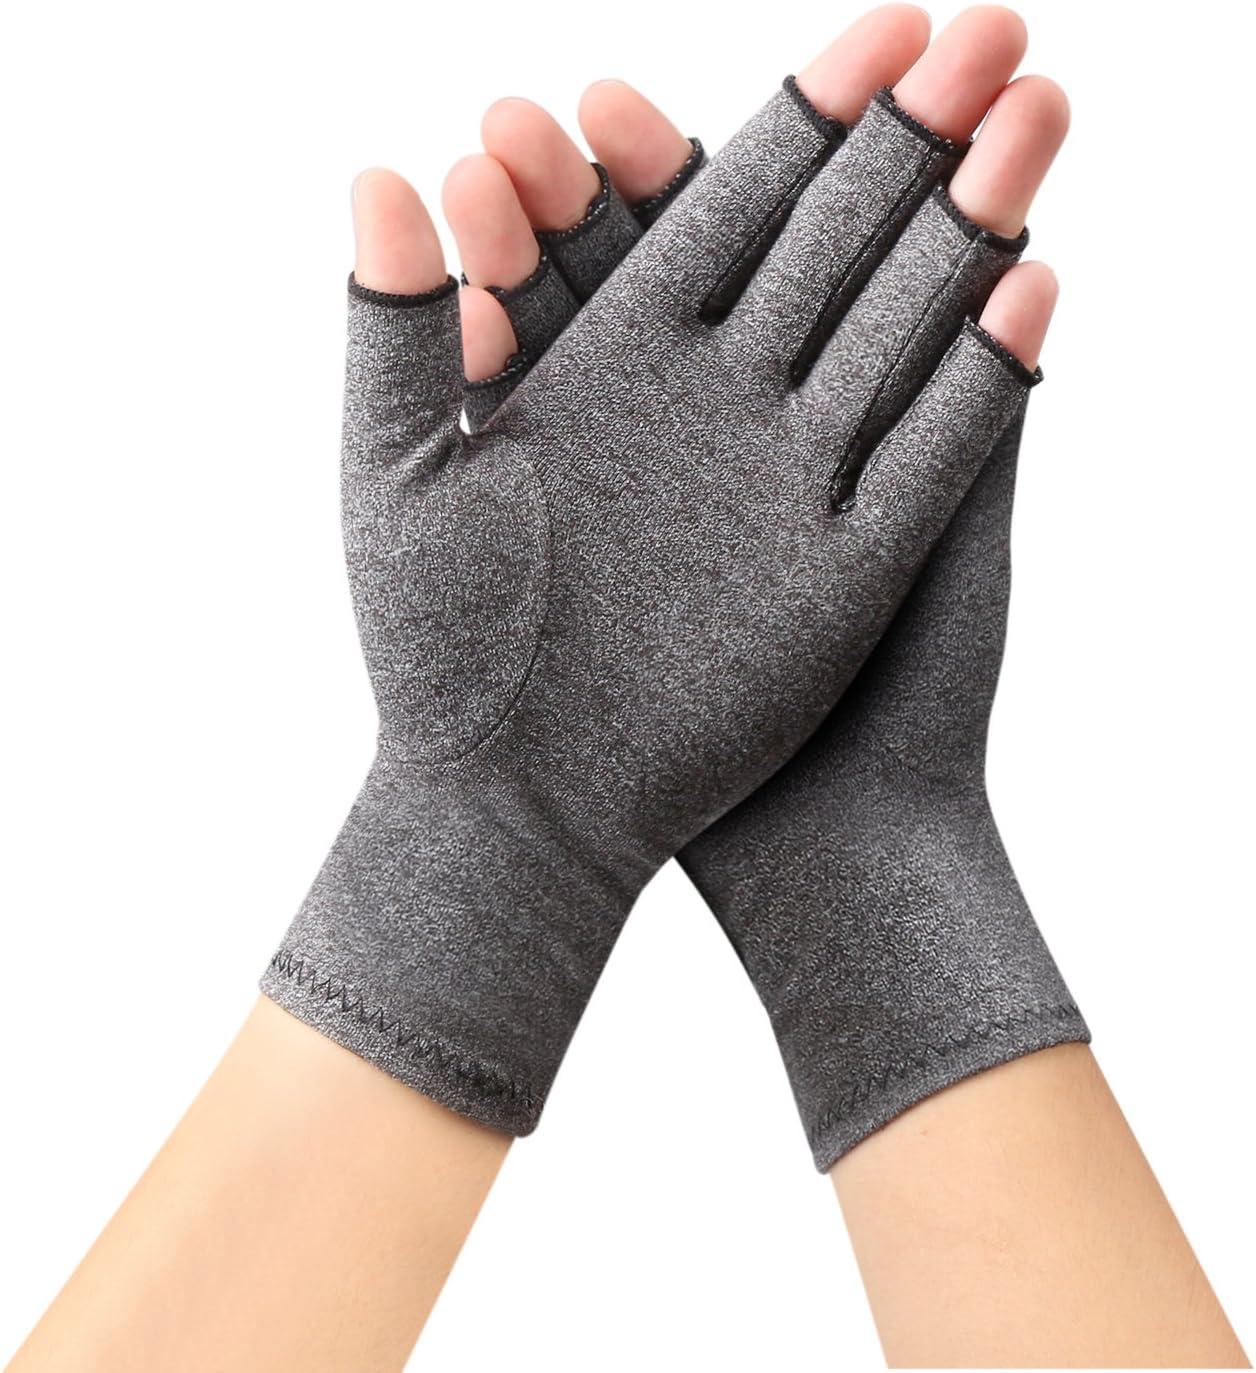 Arthritis Gloves by Sanbo Compression Gloves for Osteoarthritis Hand Gloves for Men & Women(Small)